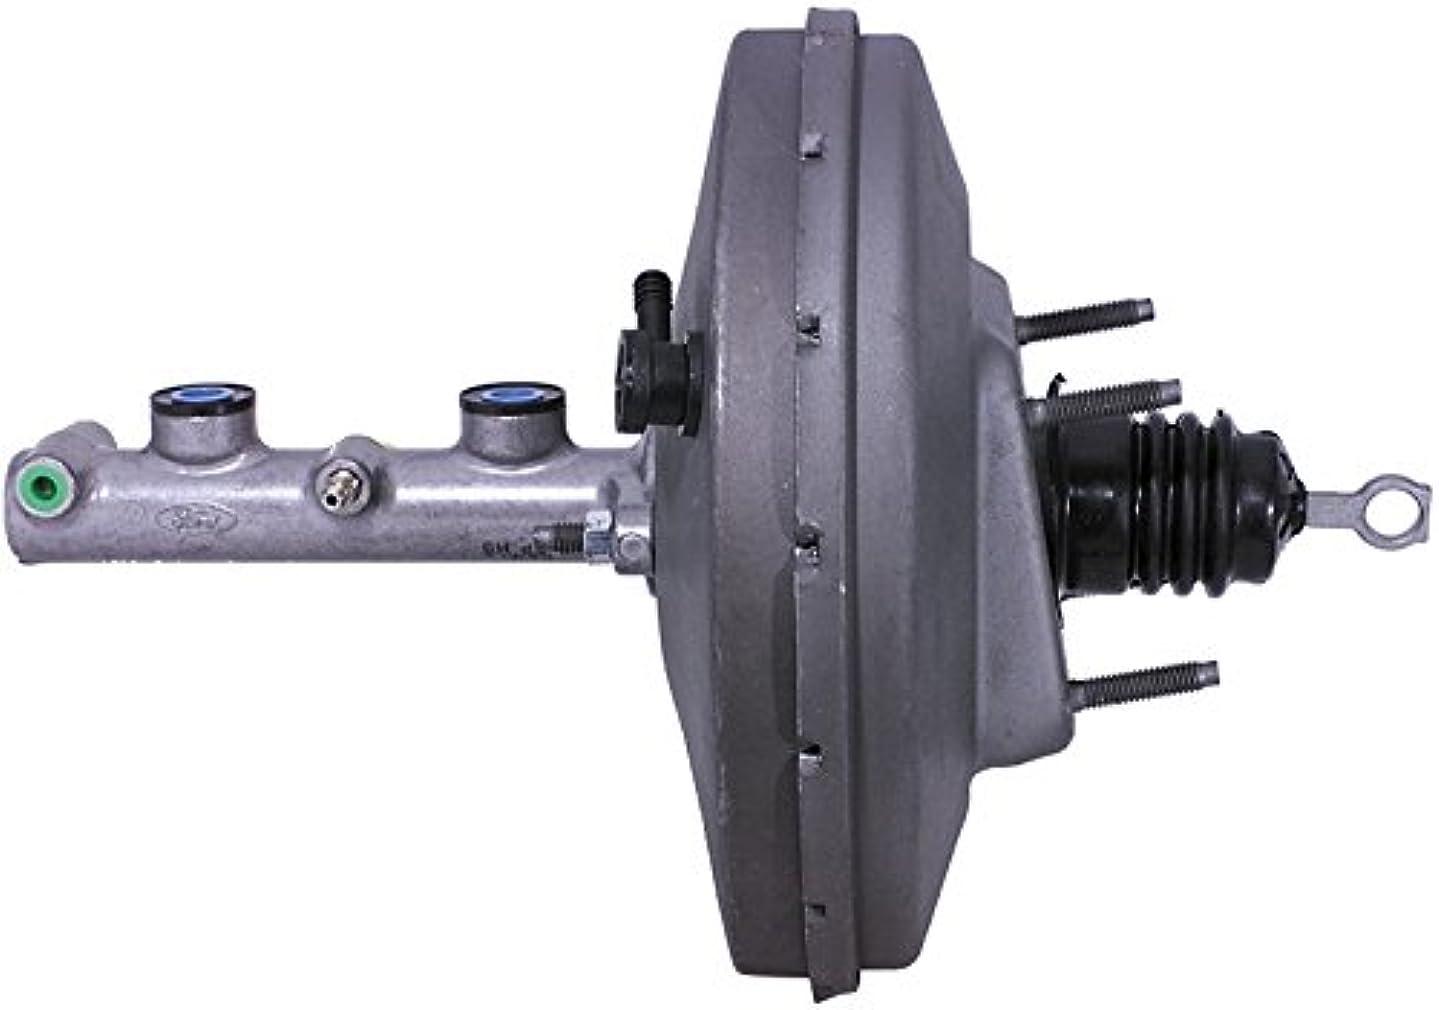 Cardone 50-4214 Remanufactured Power Brake Booster with Master Cylinder